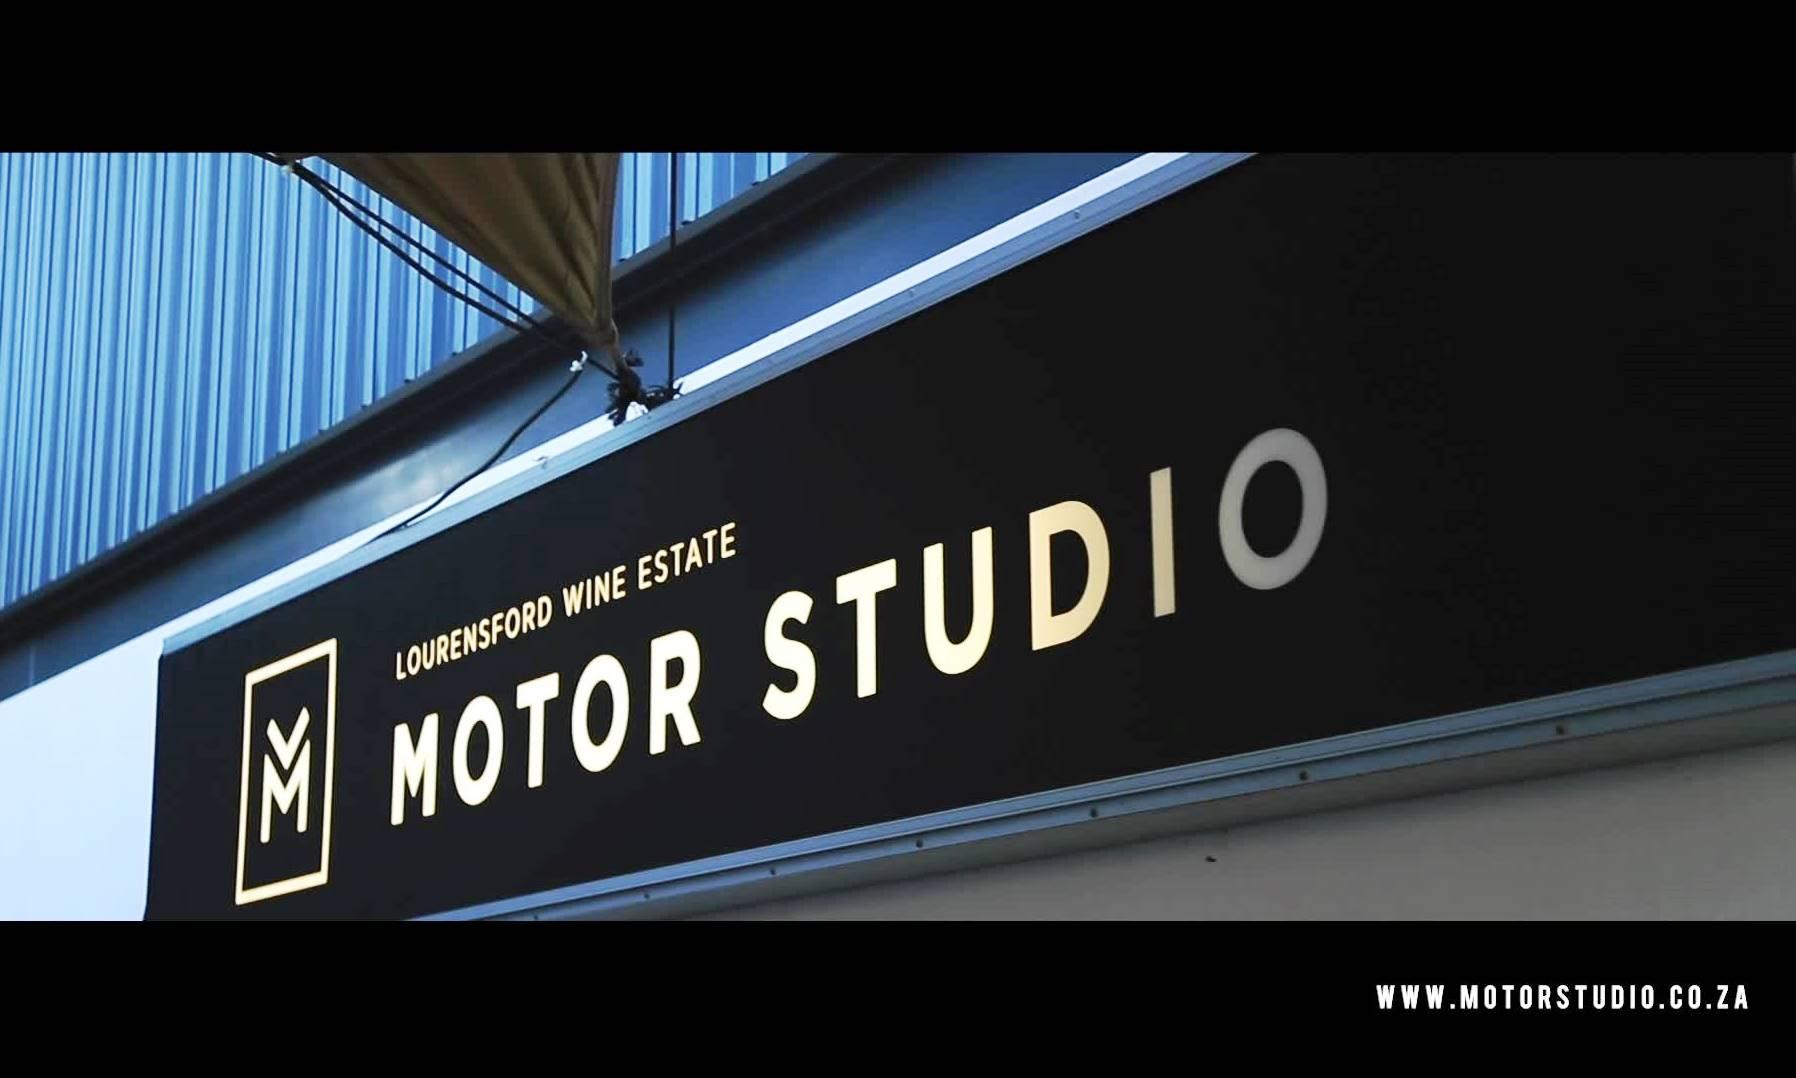 Motor Studio